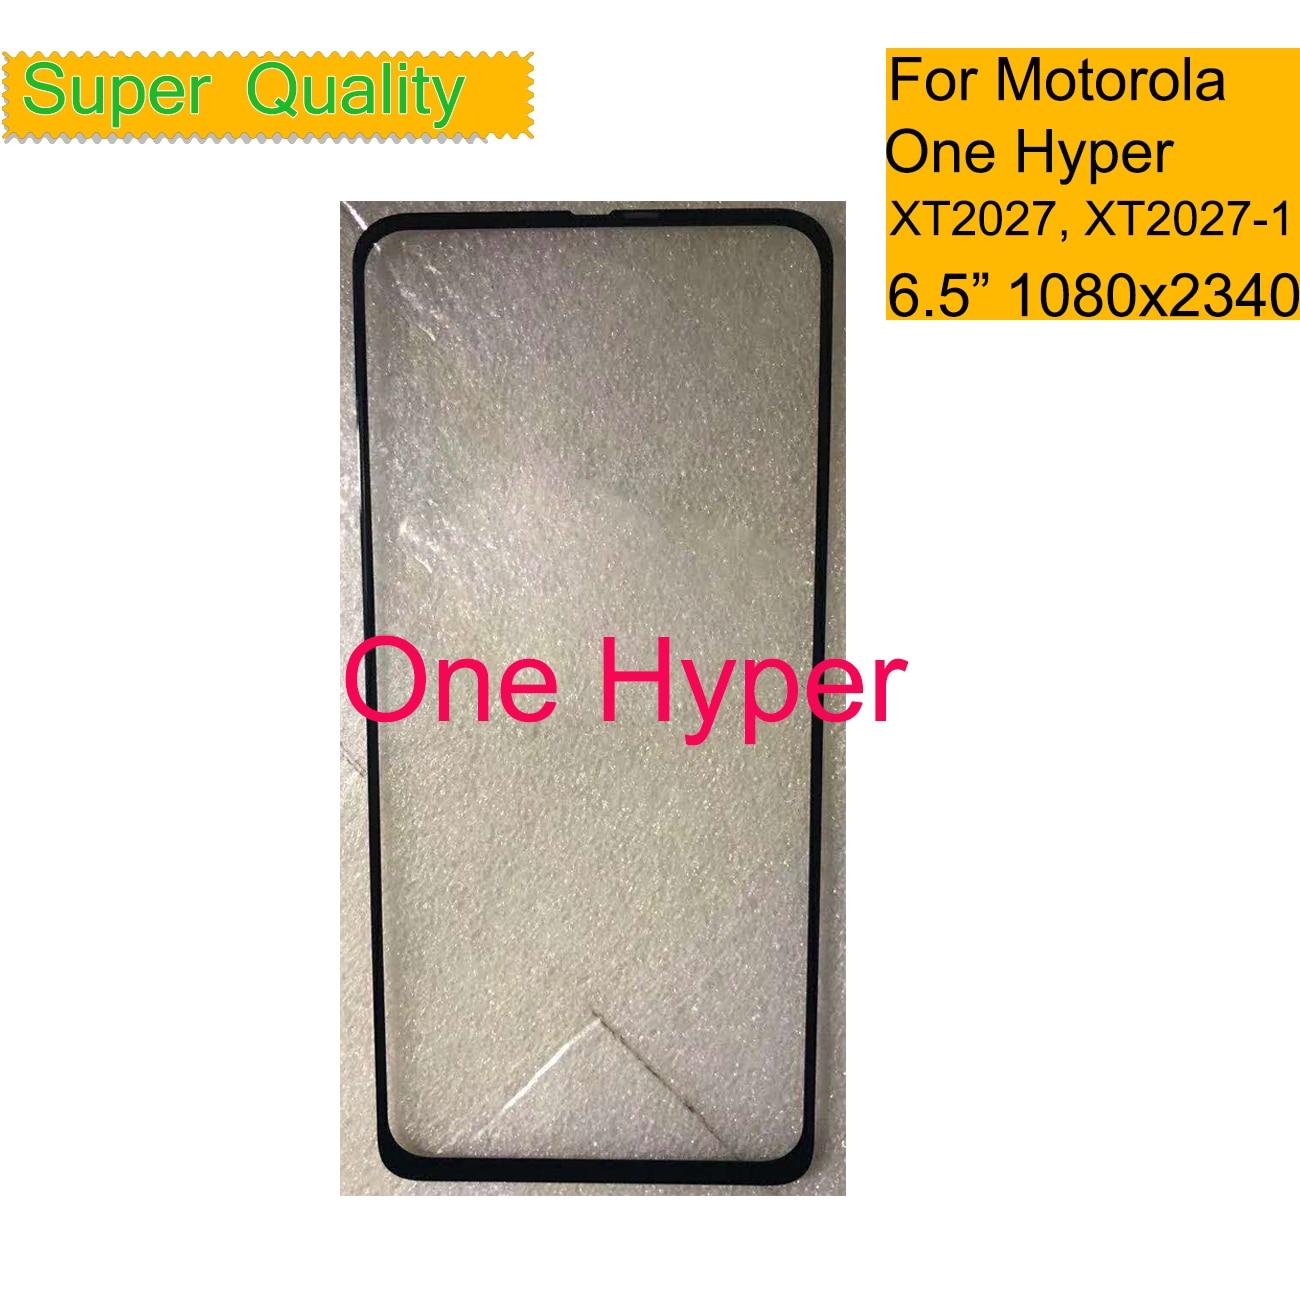 10 unids/lote para Motorola Moto una Hyper XT2027 XT2027-1 pantalla táctil Panel frontal exterior Hyper pantalla de la lente de cristal con OCA pegamento